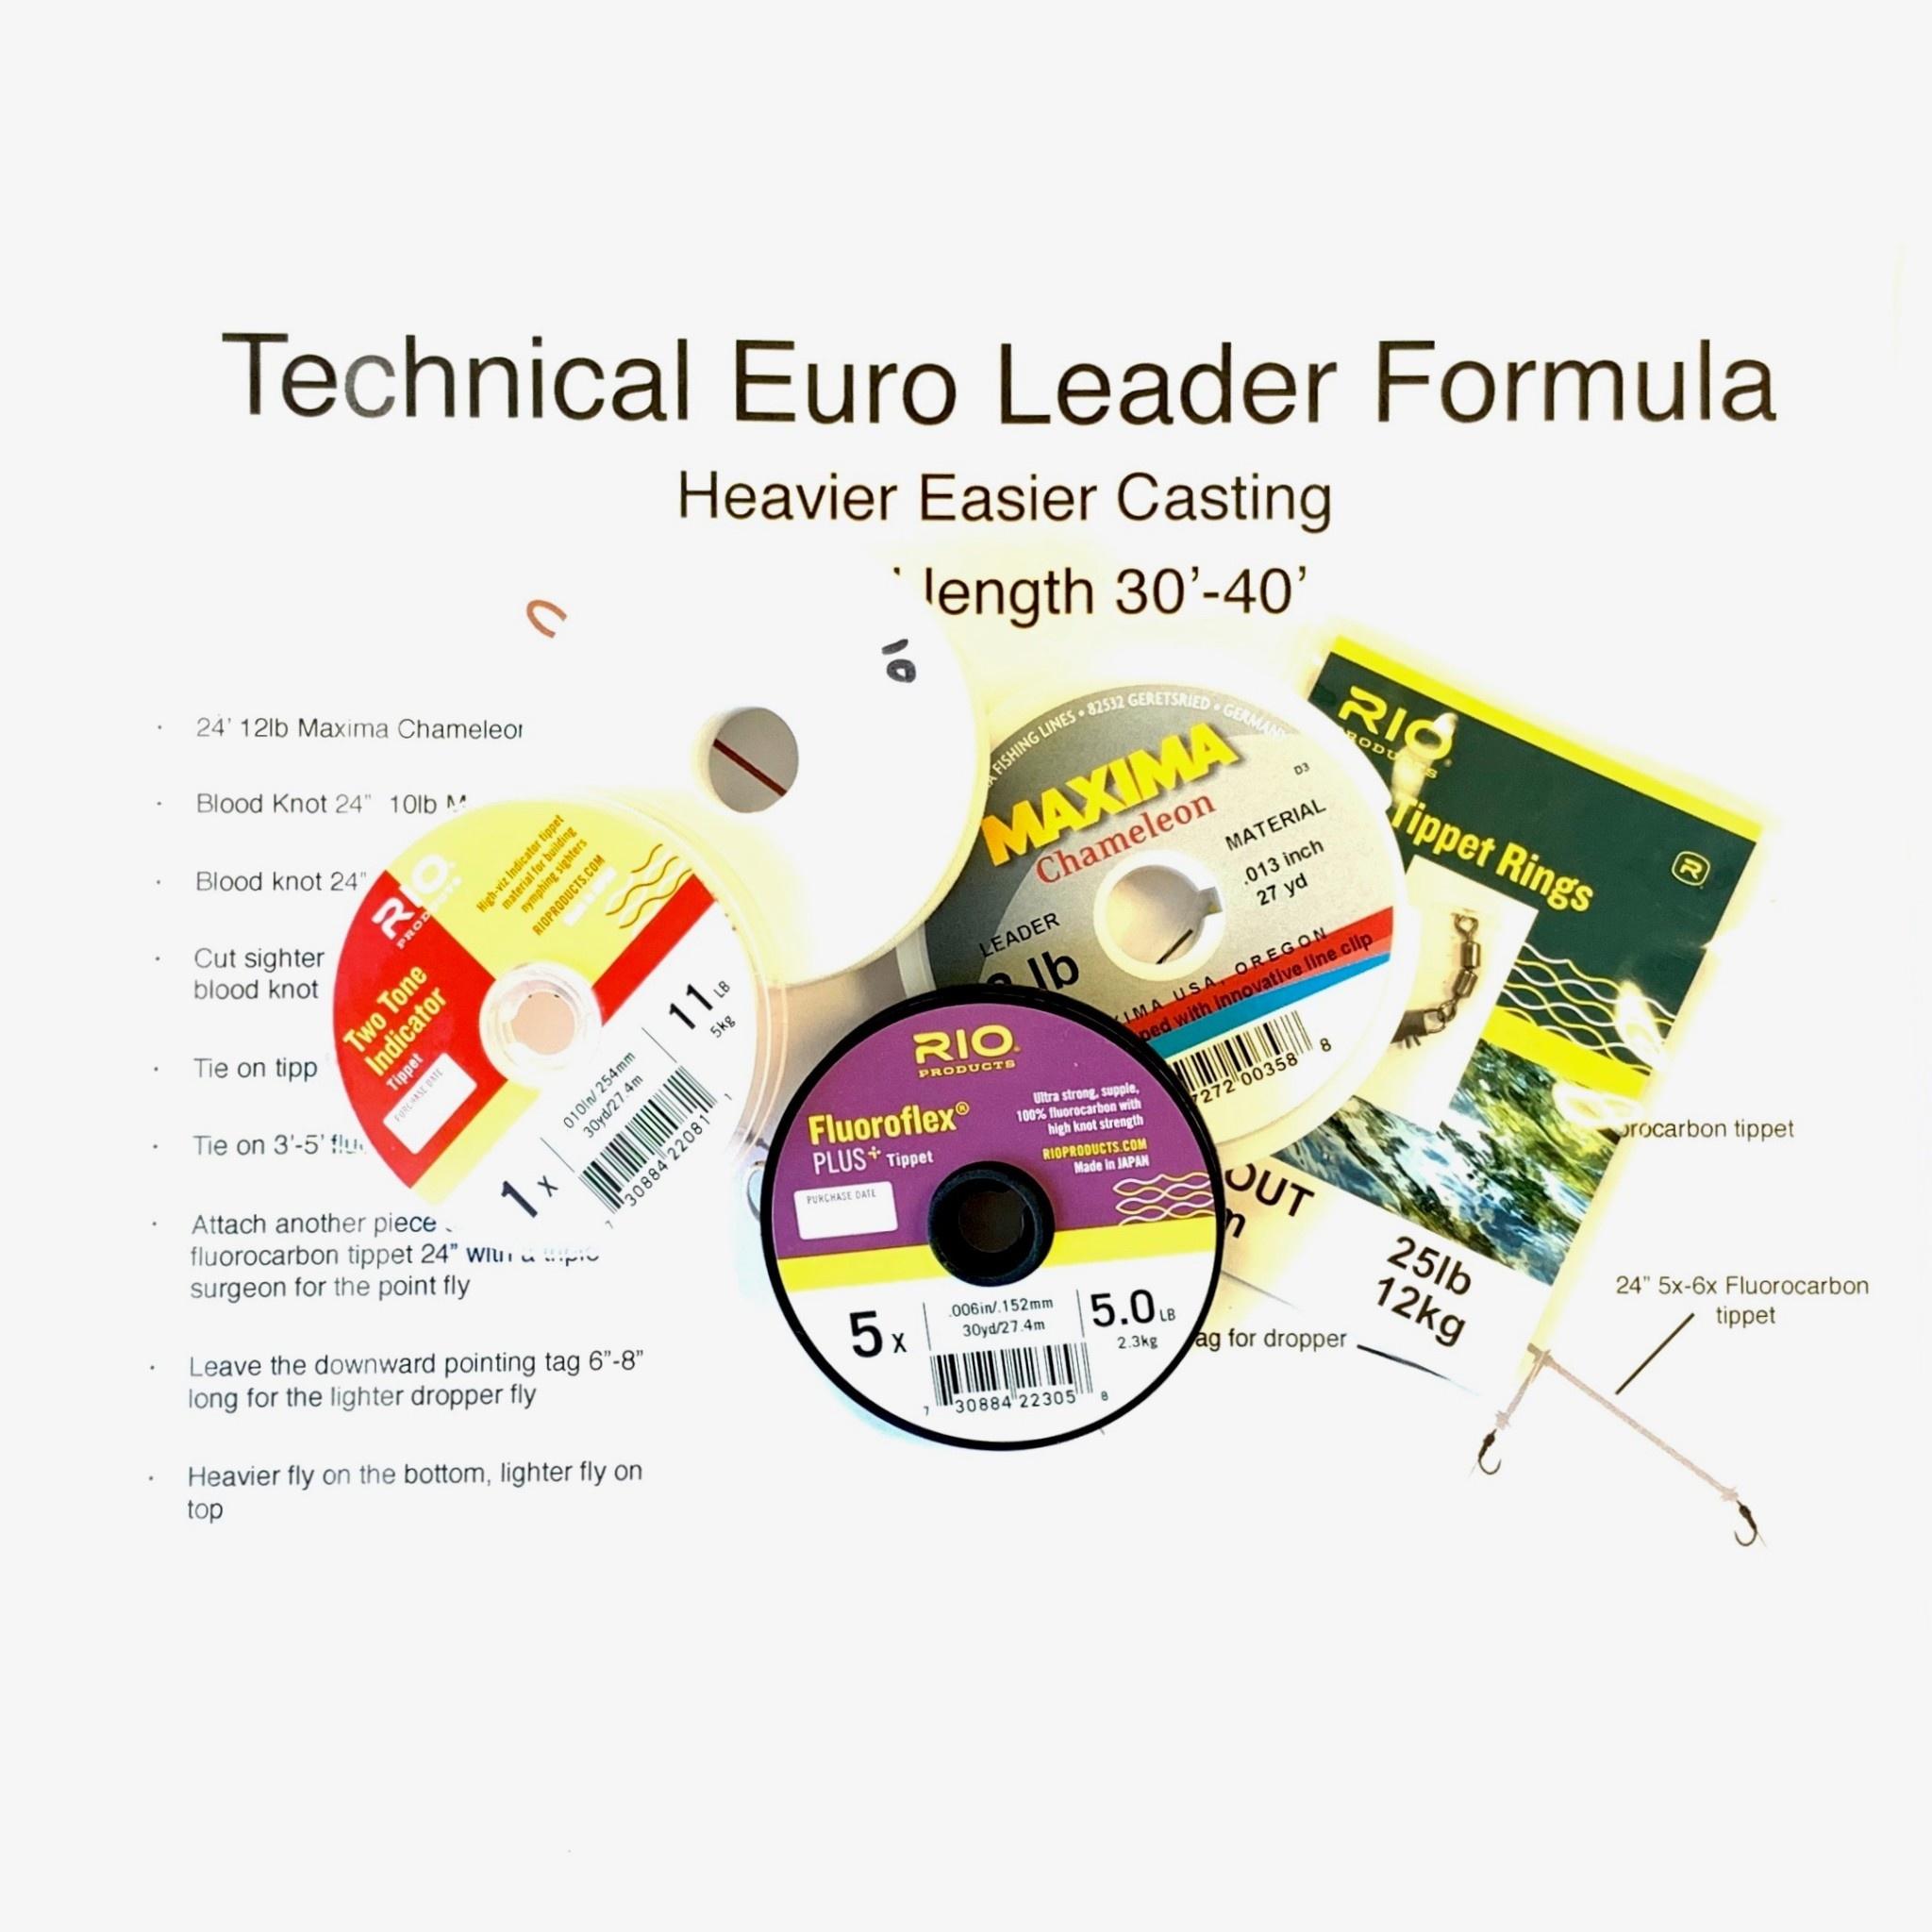 Technical Euro Leader Kits